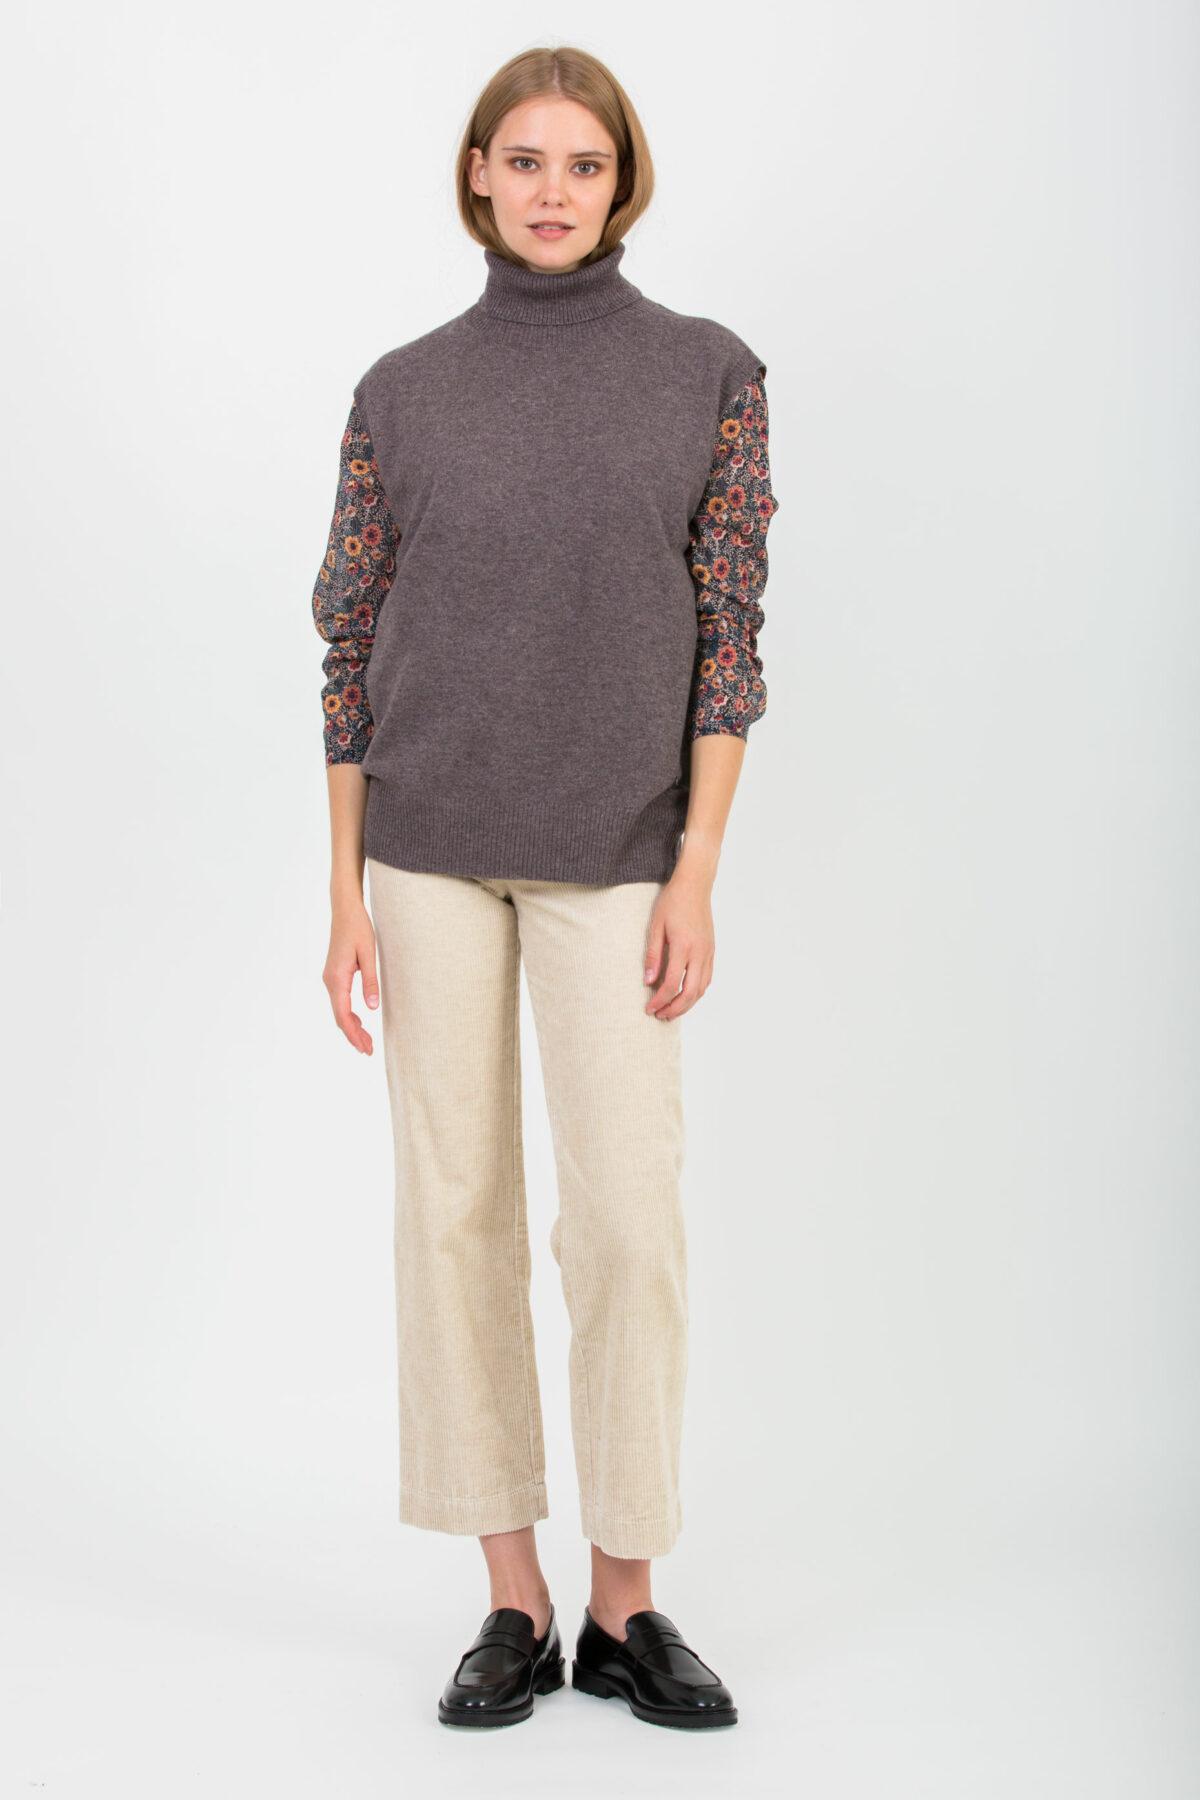 trina-brown-melange-sweater-turtleneck-twist-tango-matchboxathens